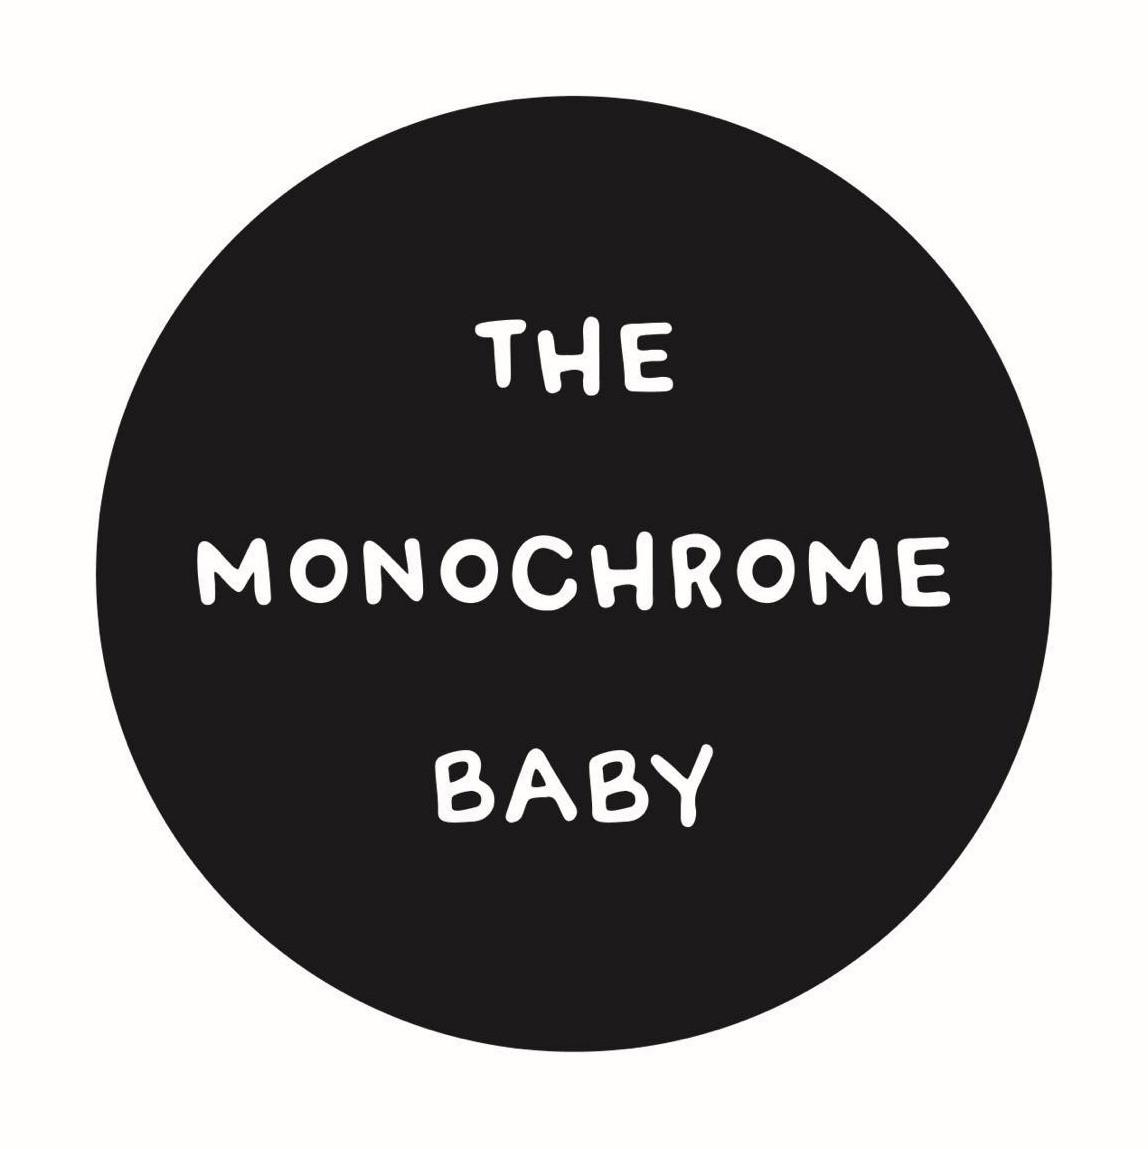 The Monochrome Baby